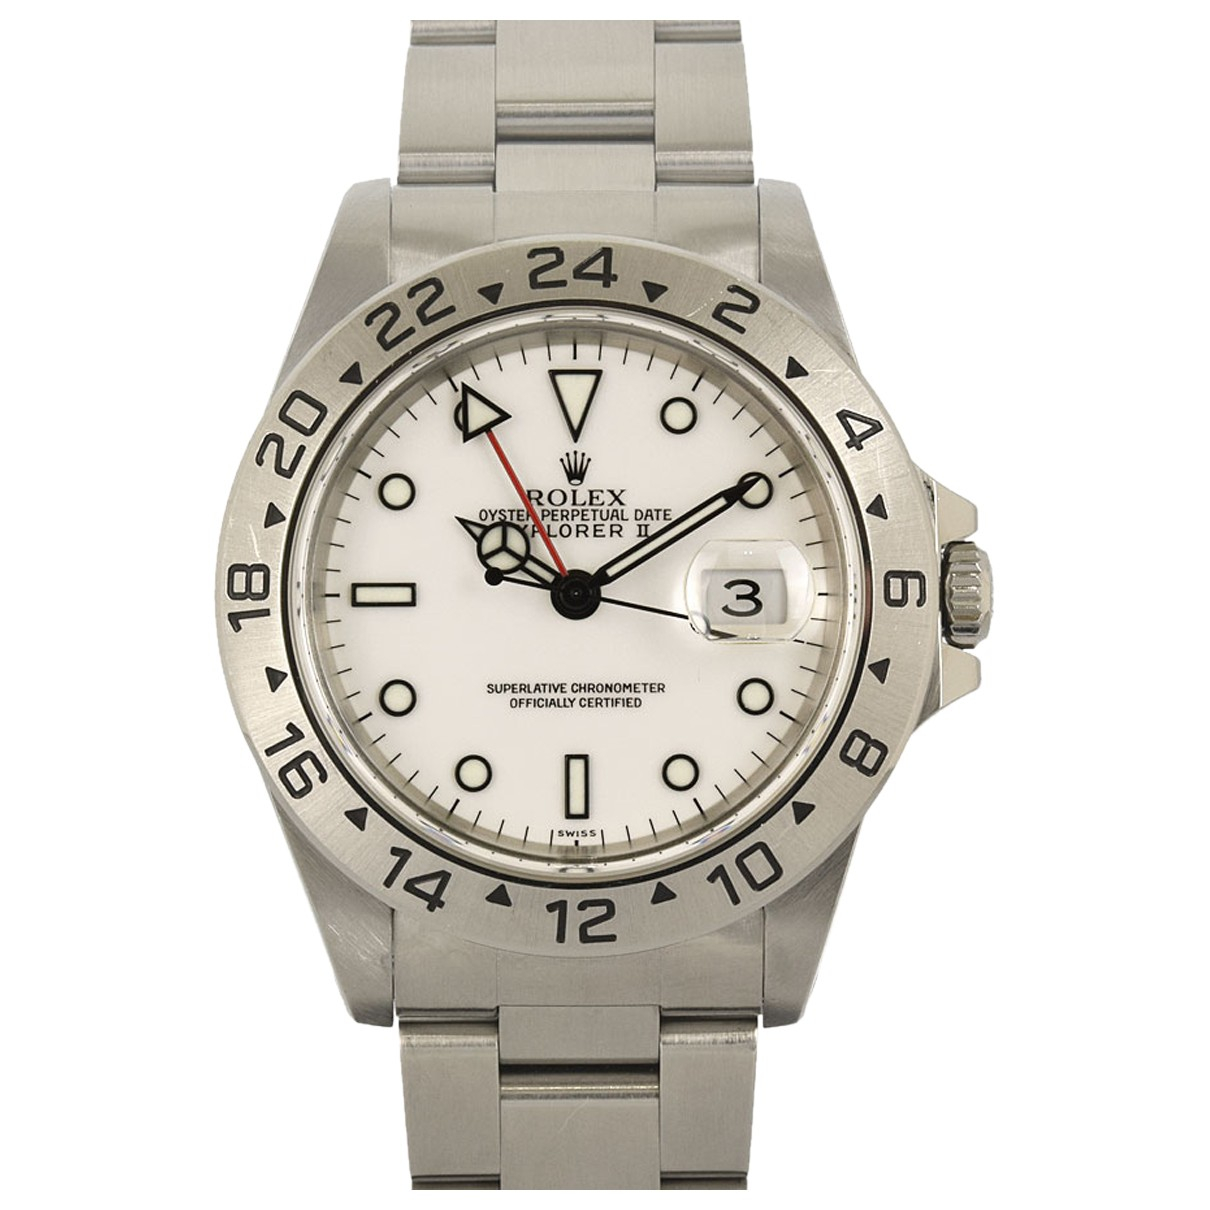 Rolex Explorer II 42mm White Steel Watch for Men